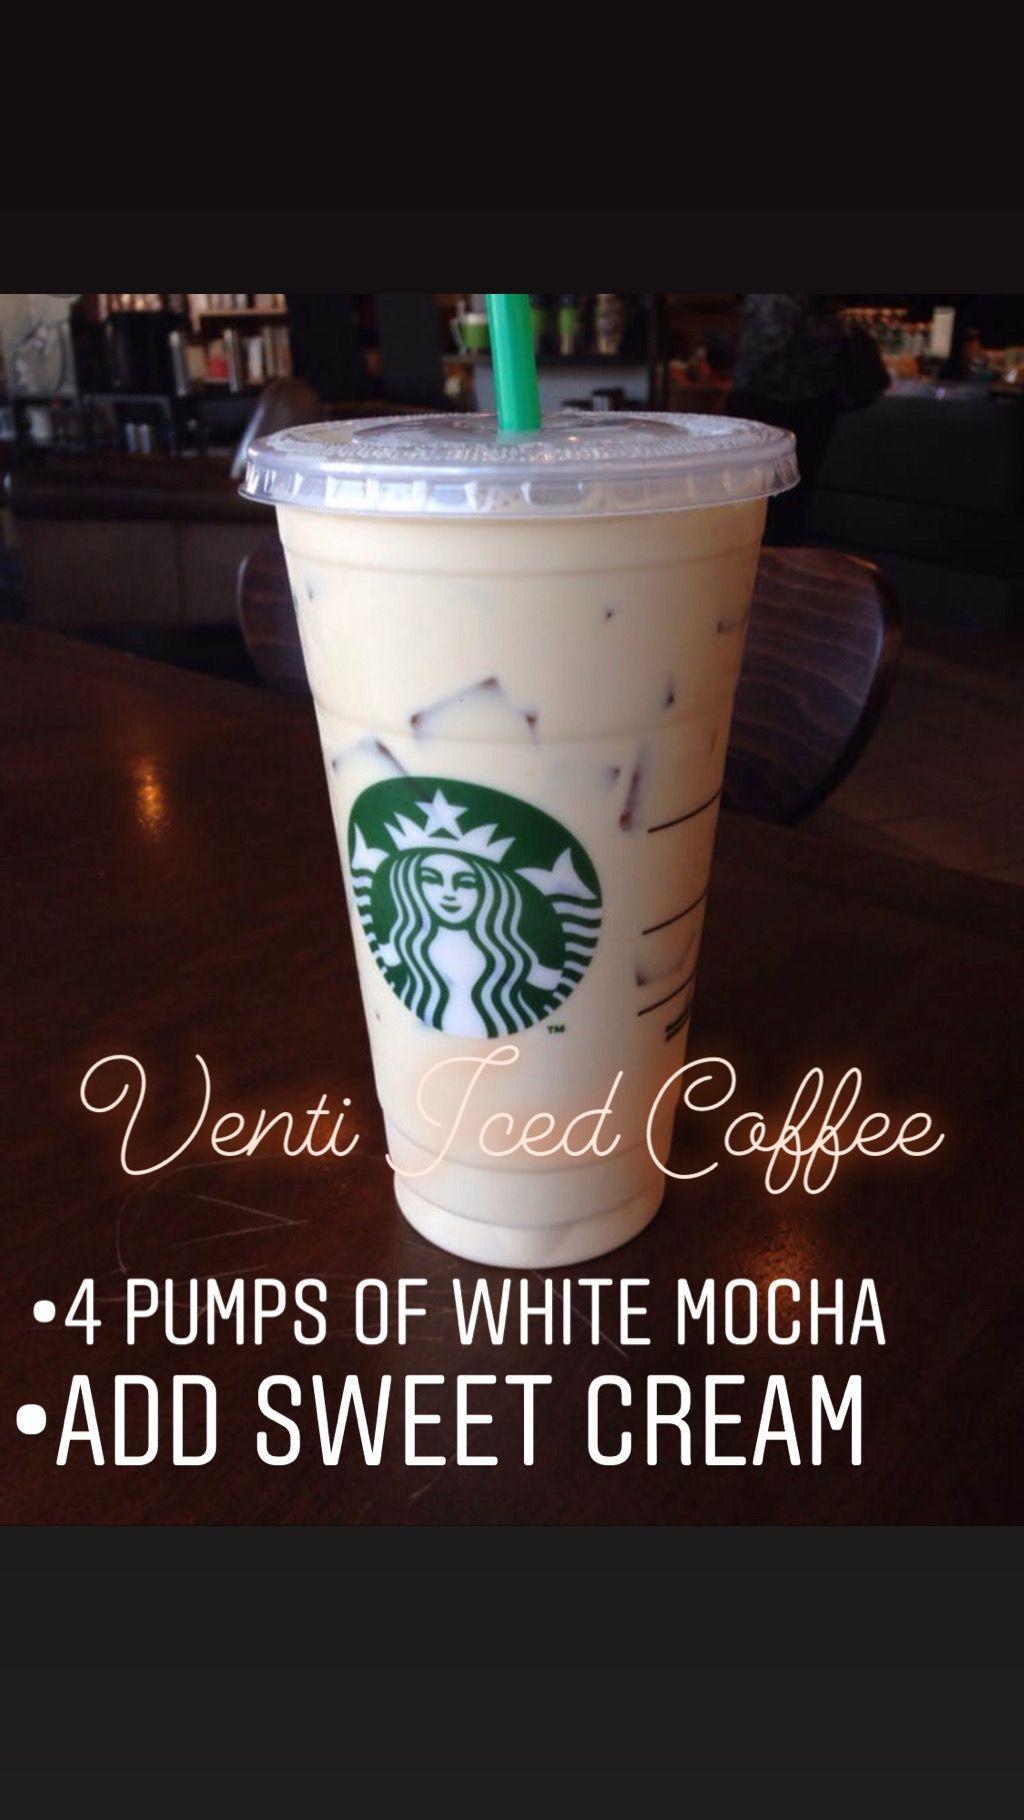 Starbucks Drinks in 2020 Starbucks drinks recipes